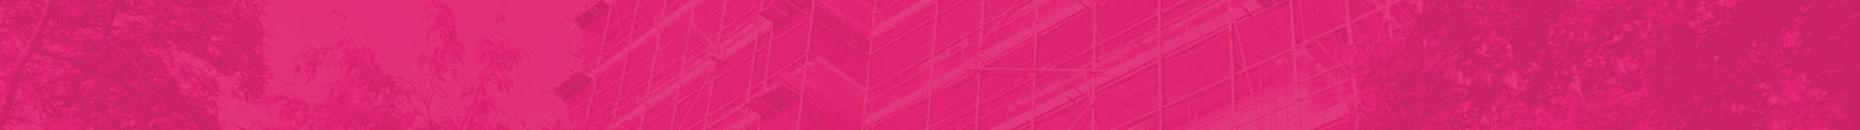 Pink-strip.jpg